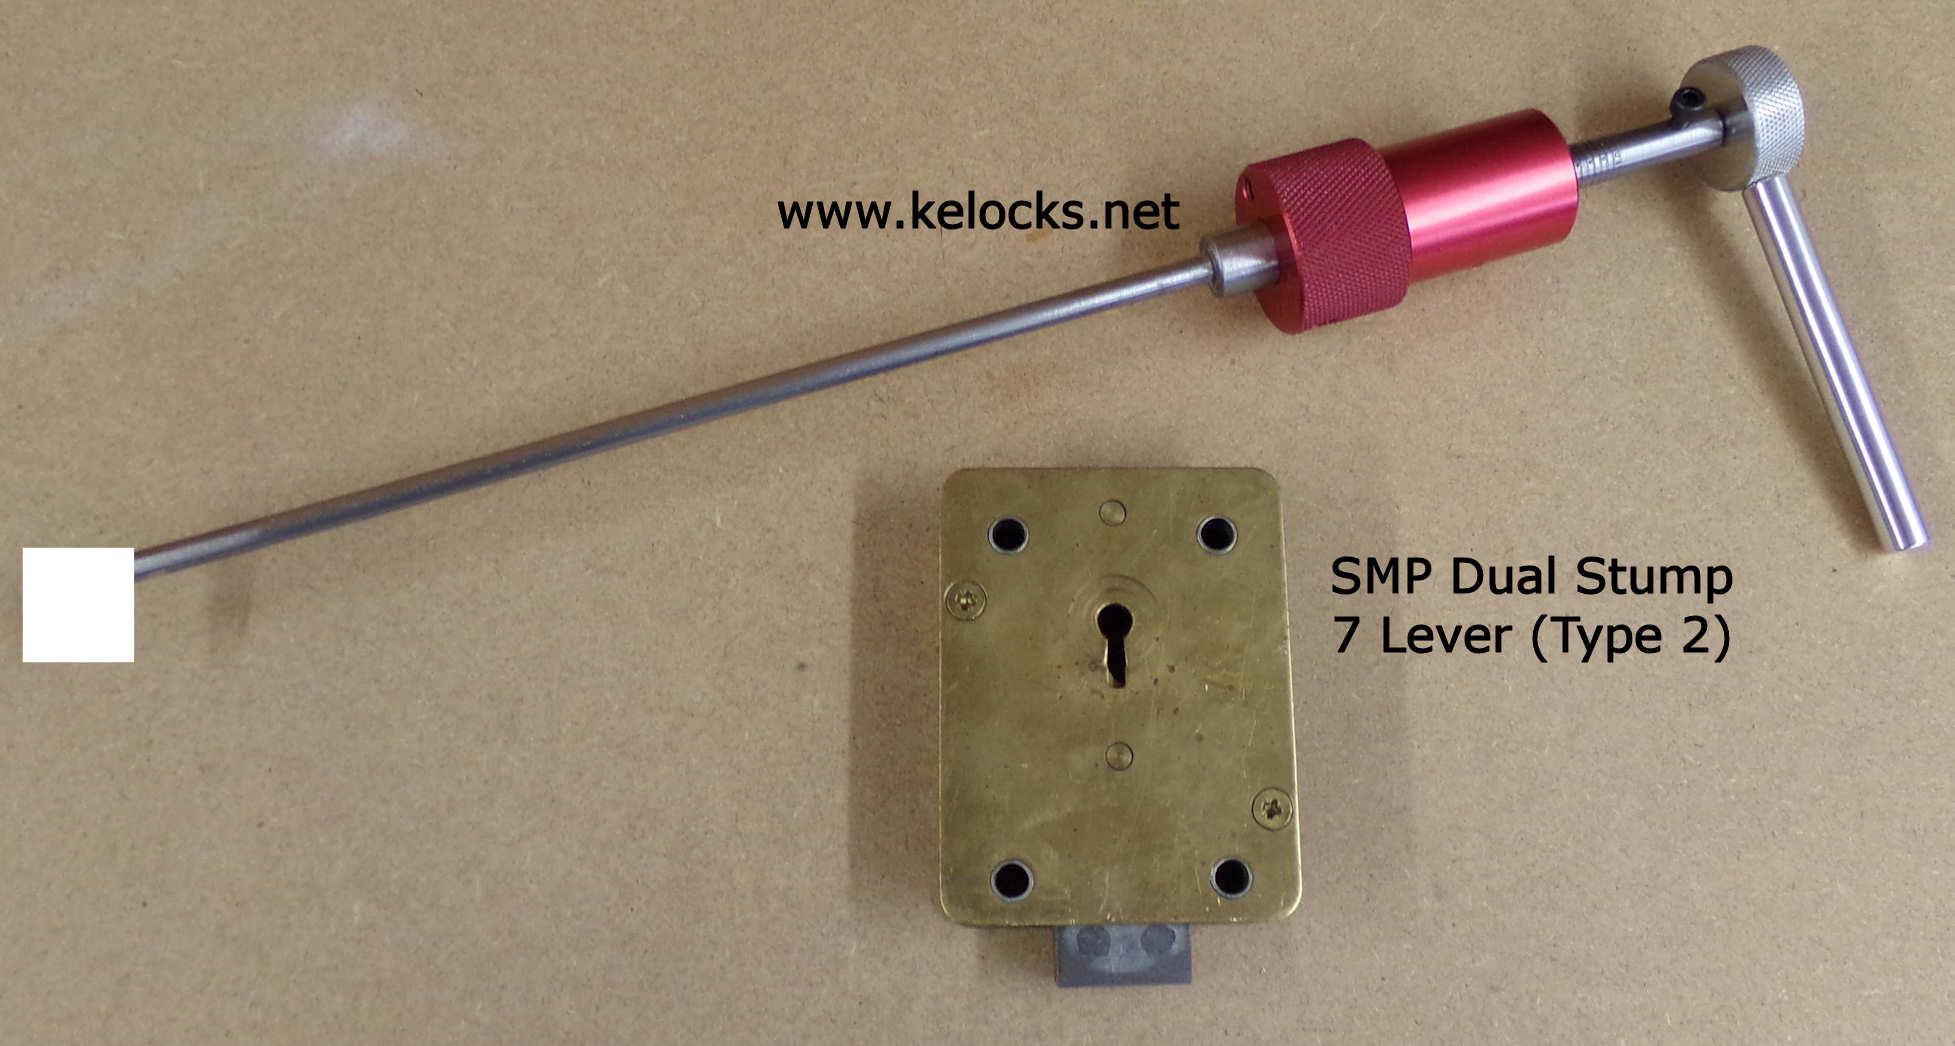 SMP 7 Lever Dual Stump Safe Lock PIck (Type 2)